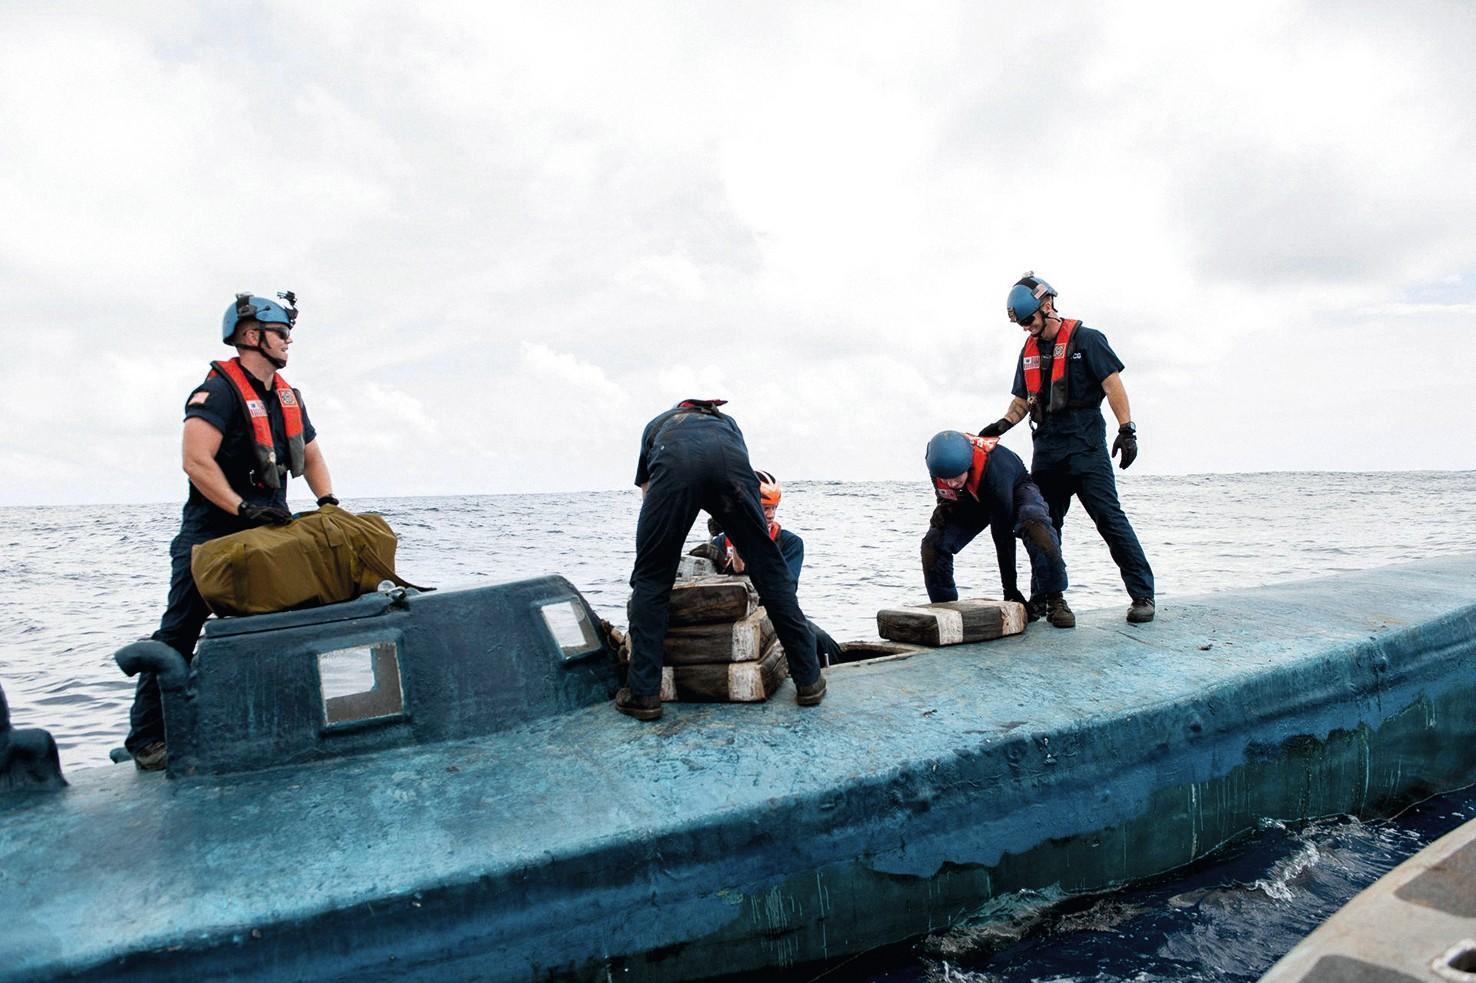 Un sous-marin transportant de la drogue vers les États-Unis